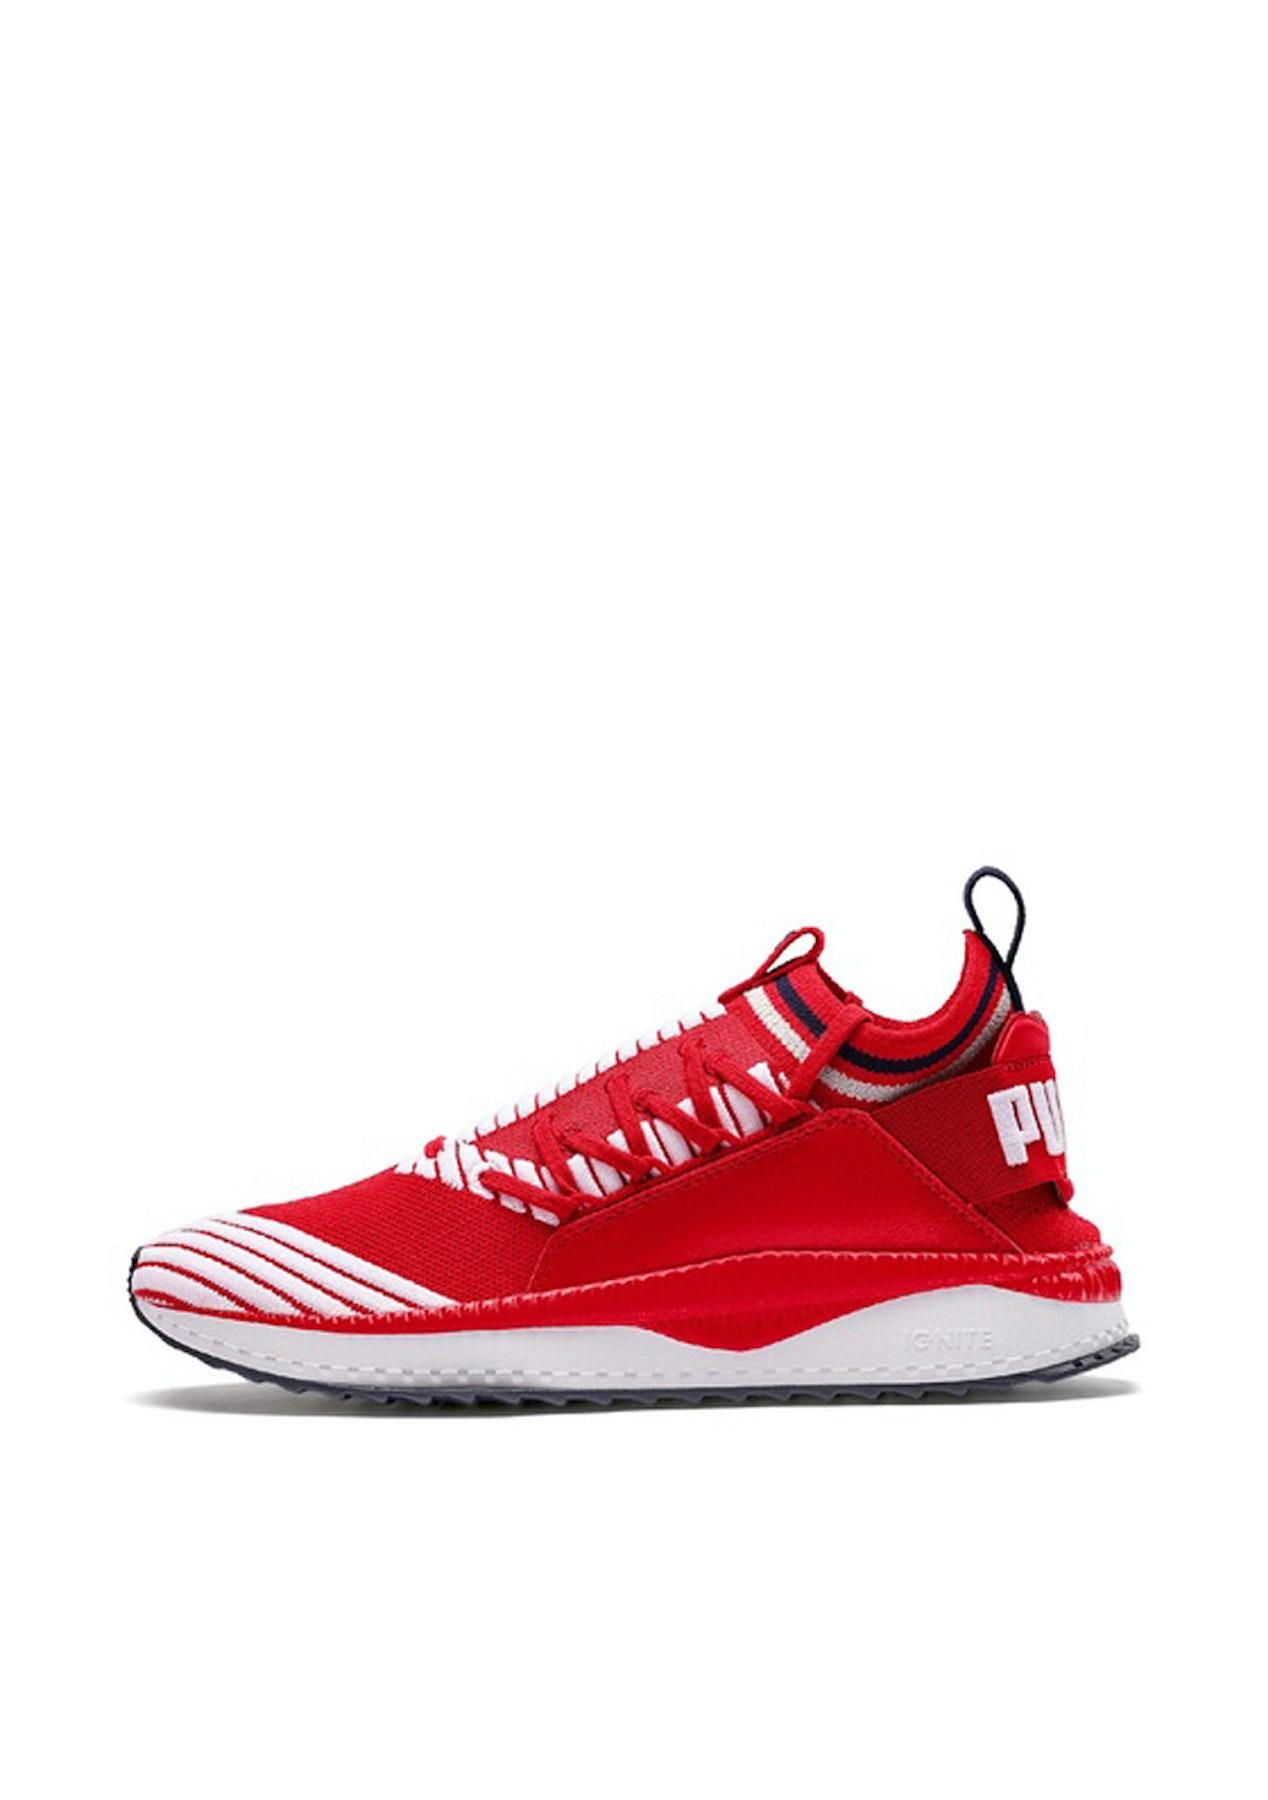 70d7f7880a9 Puma - Mens Tsugi Jun Sport Stripes - Red White - Puma Refresh - Onceit